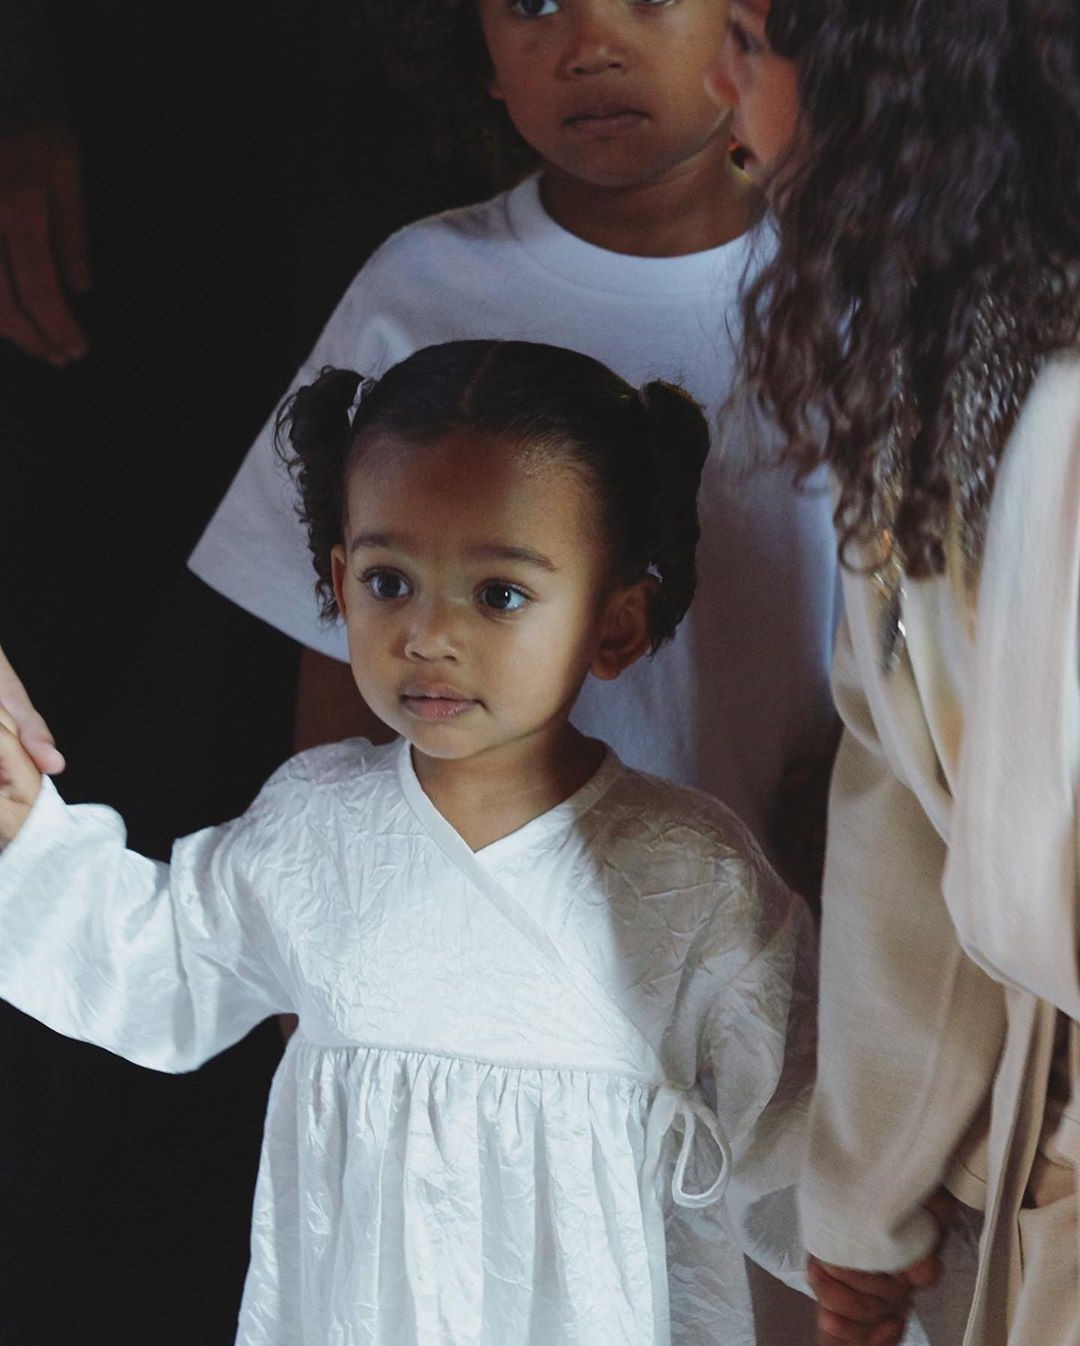 Kim Kardashian And Her Kids Baptized In Armenian Church #7 | Her Beauty